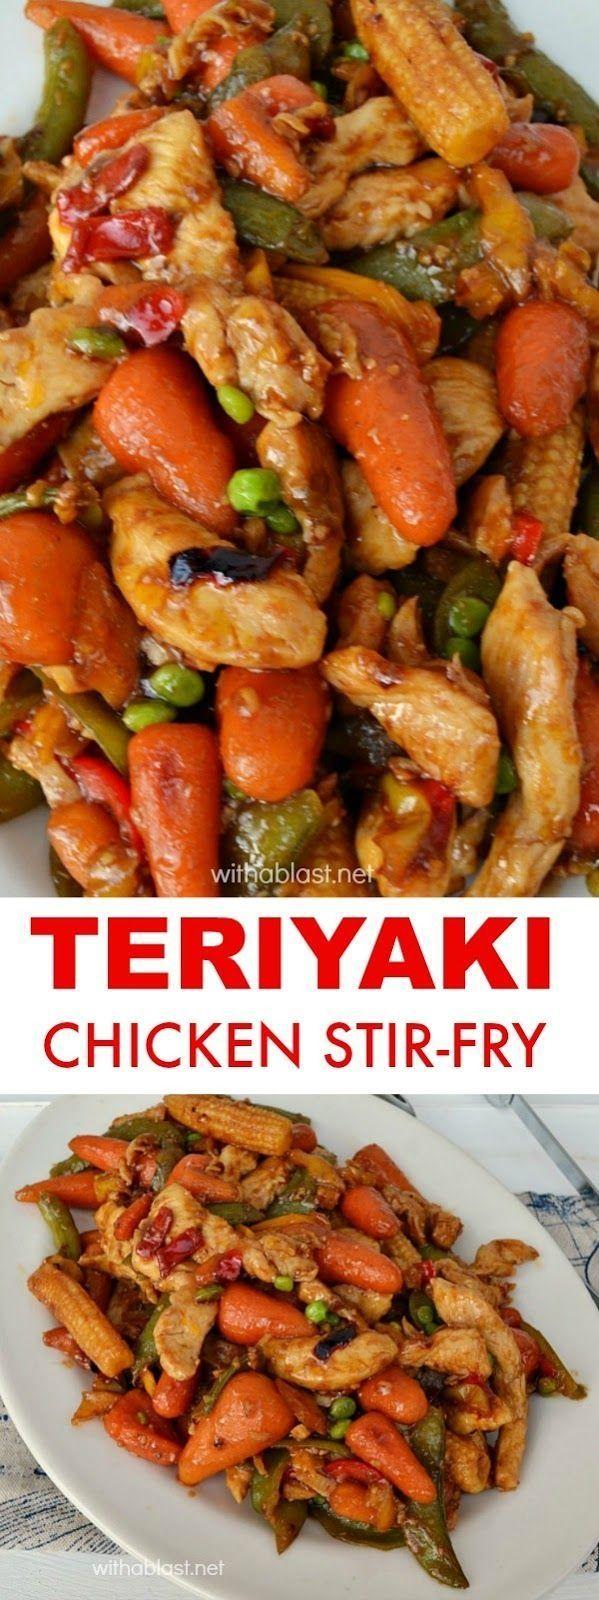 Chicken Broccoli Stir Fry  Recipe  Chinese  Wok Recipes -6378